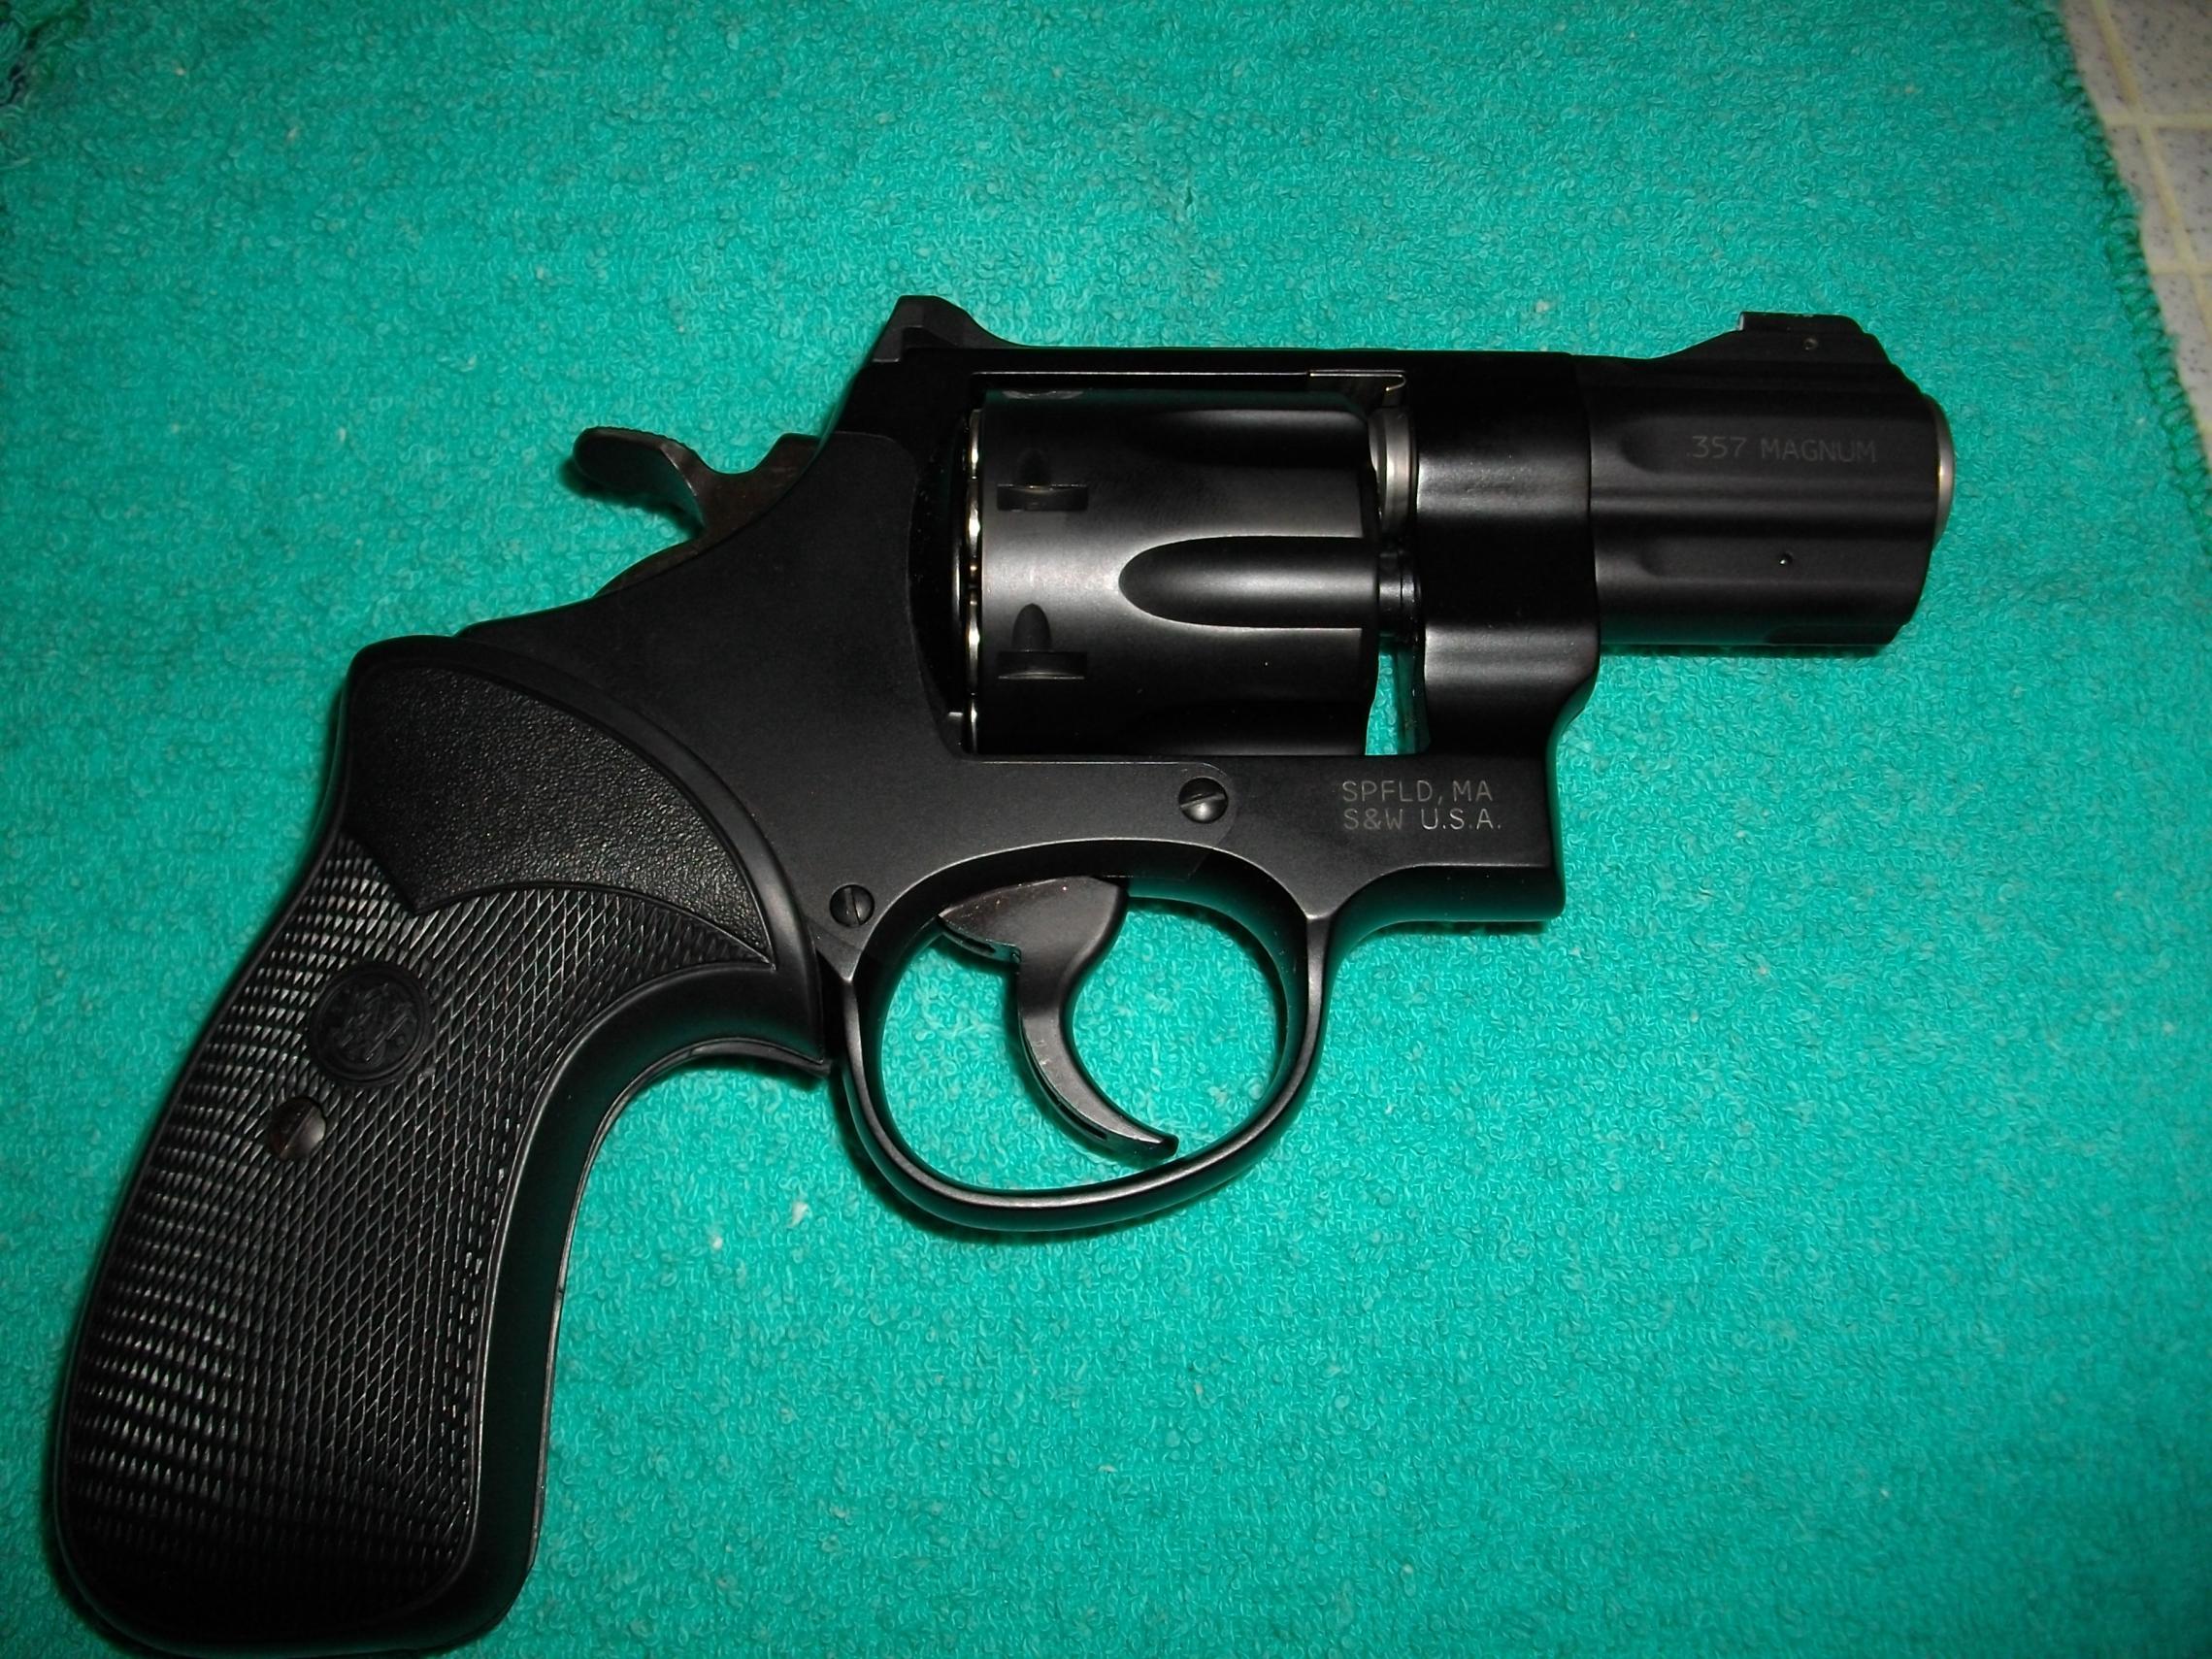 New Smith&Wesson-sany0076.jpg